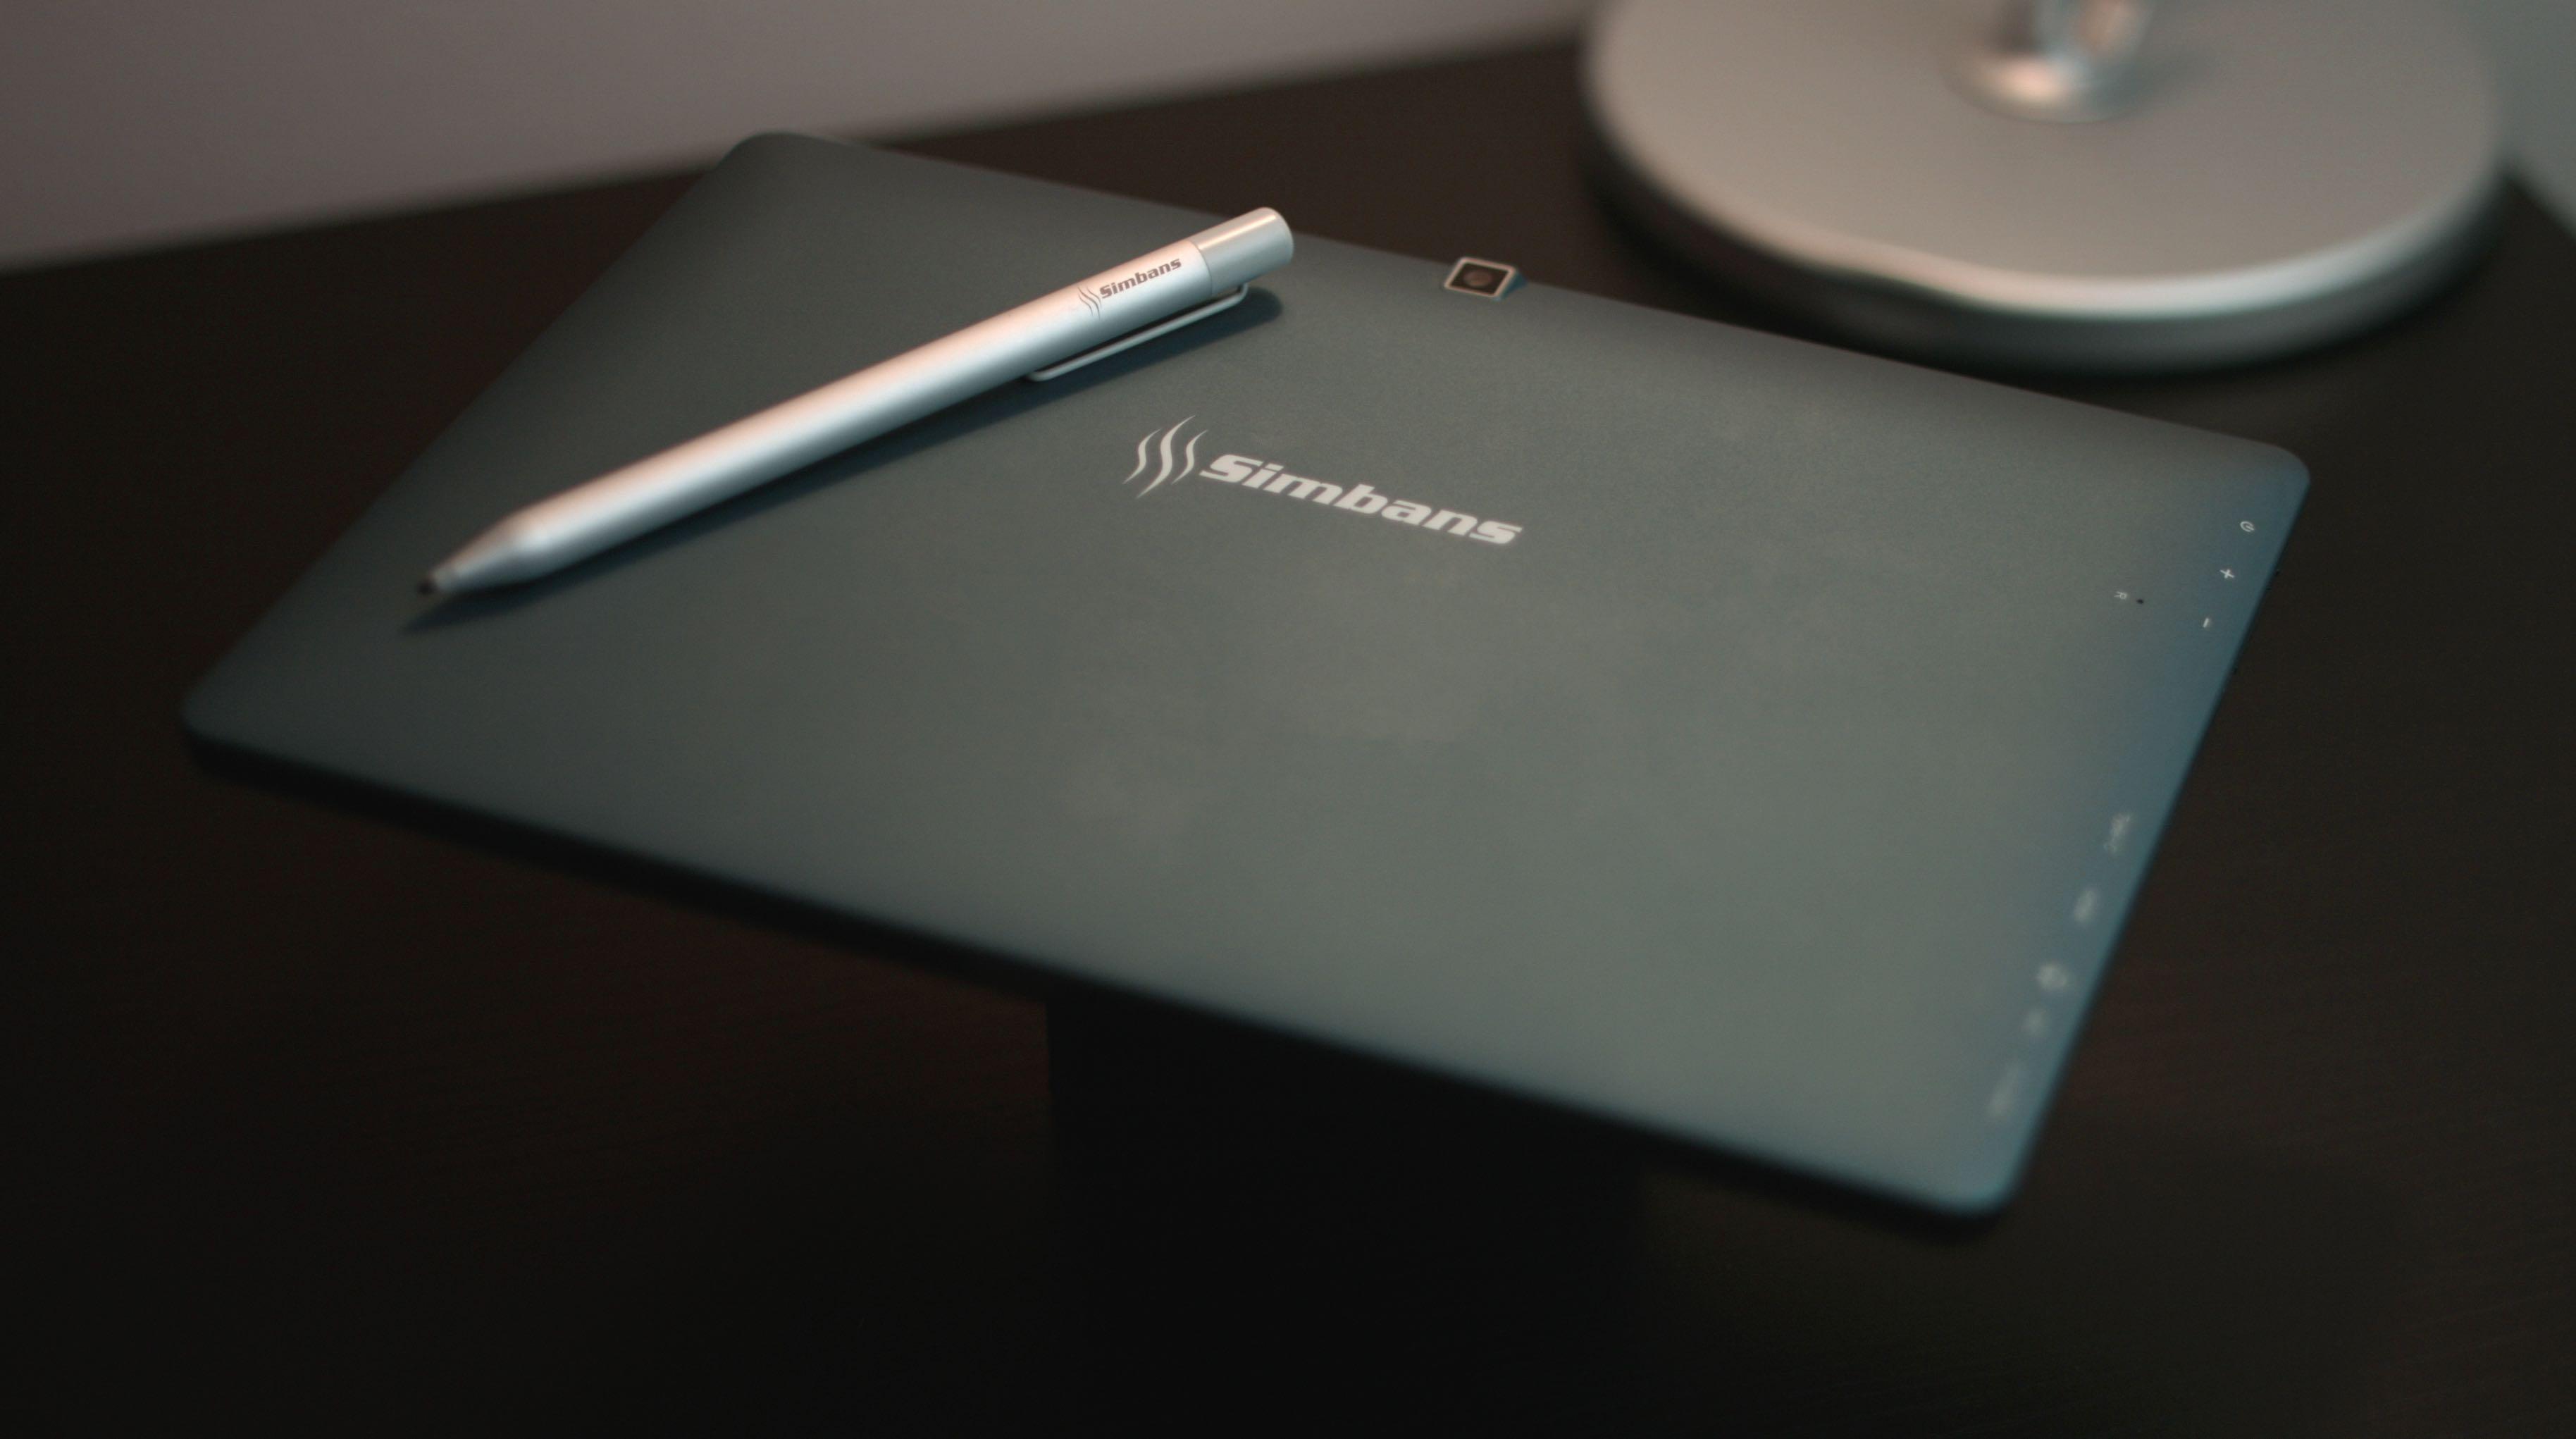 PicassoTab Multi-Purpose Drawing Tablet